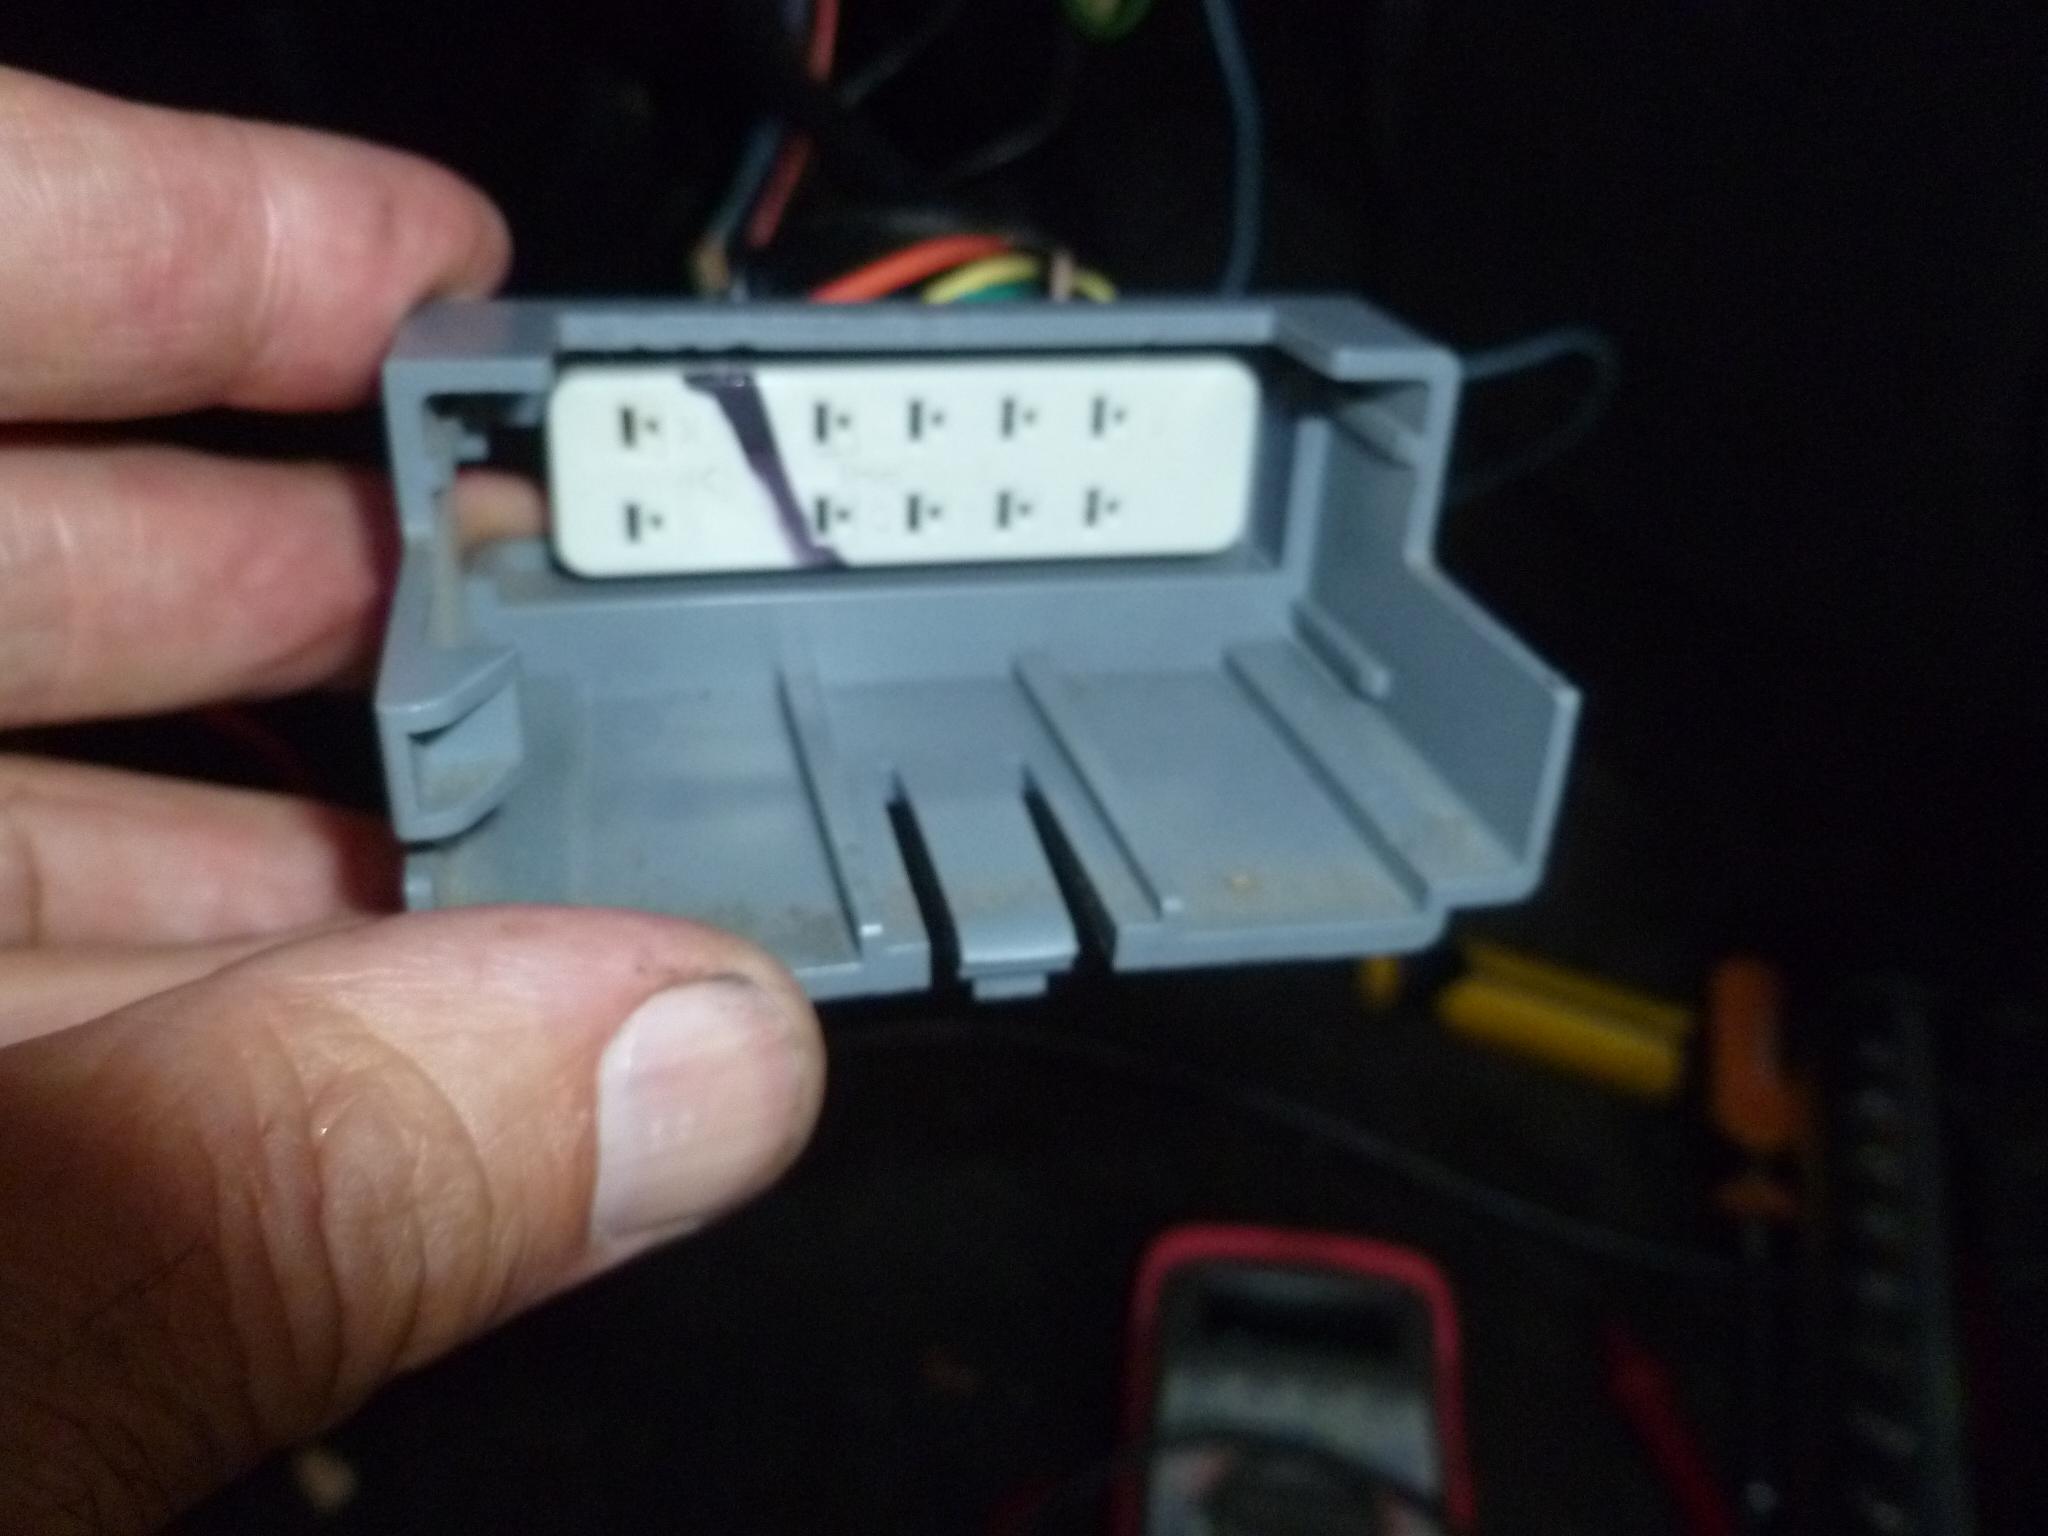 2005 Trailblazer Had P1682 00 Now Have No Communication To Ecm 2004 Pcm Wiring Diagram Pinout Chevy Ss P1070255